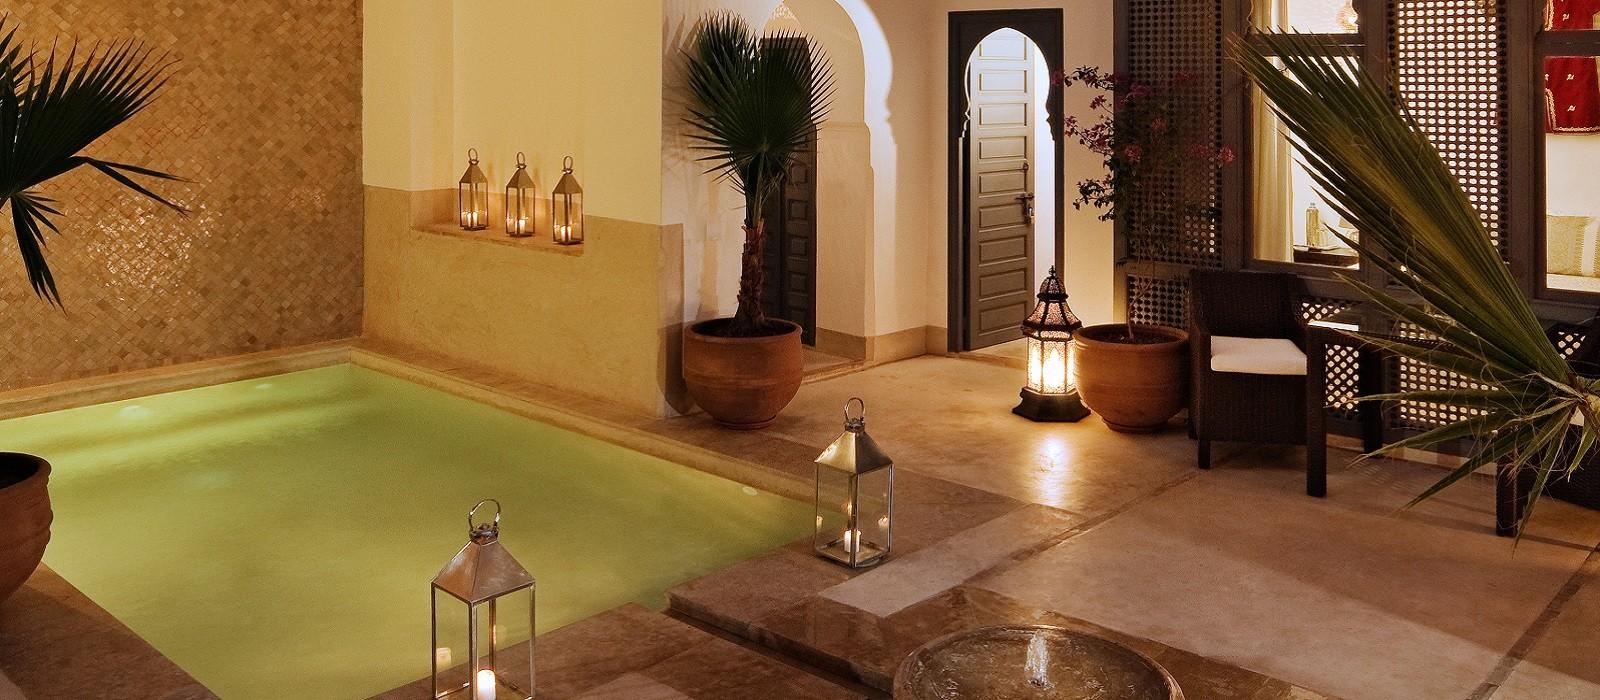 Hotel Riad Adore Marokko